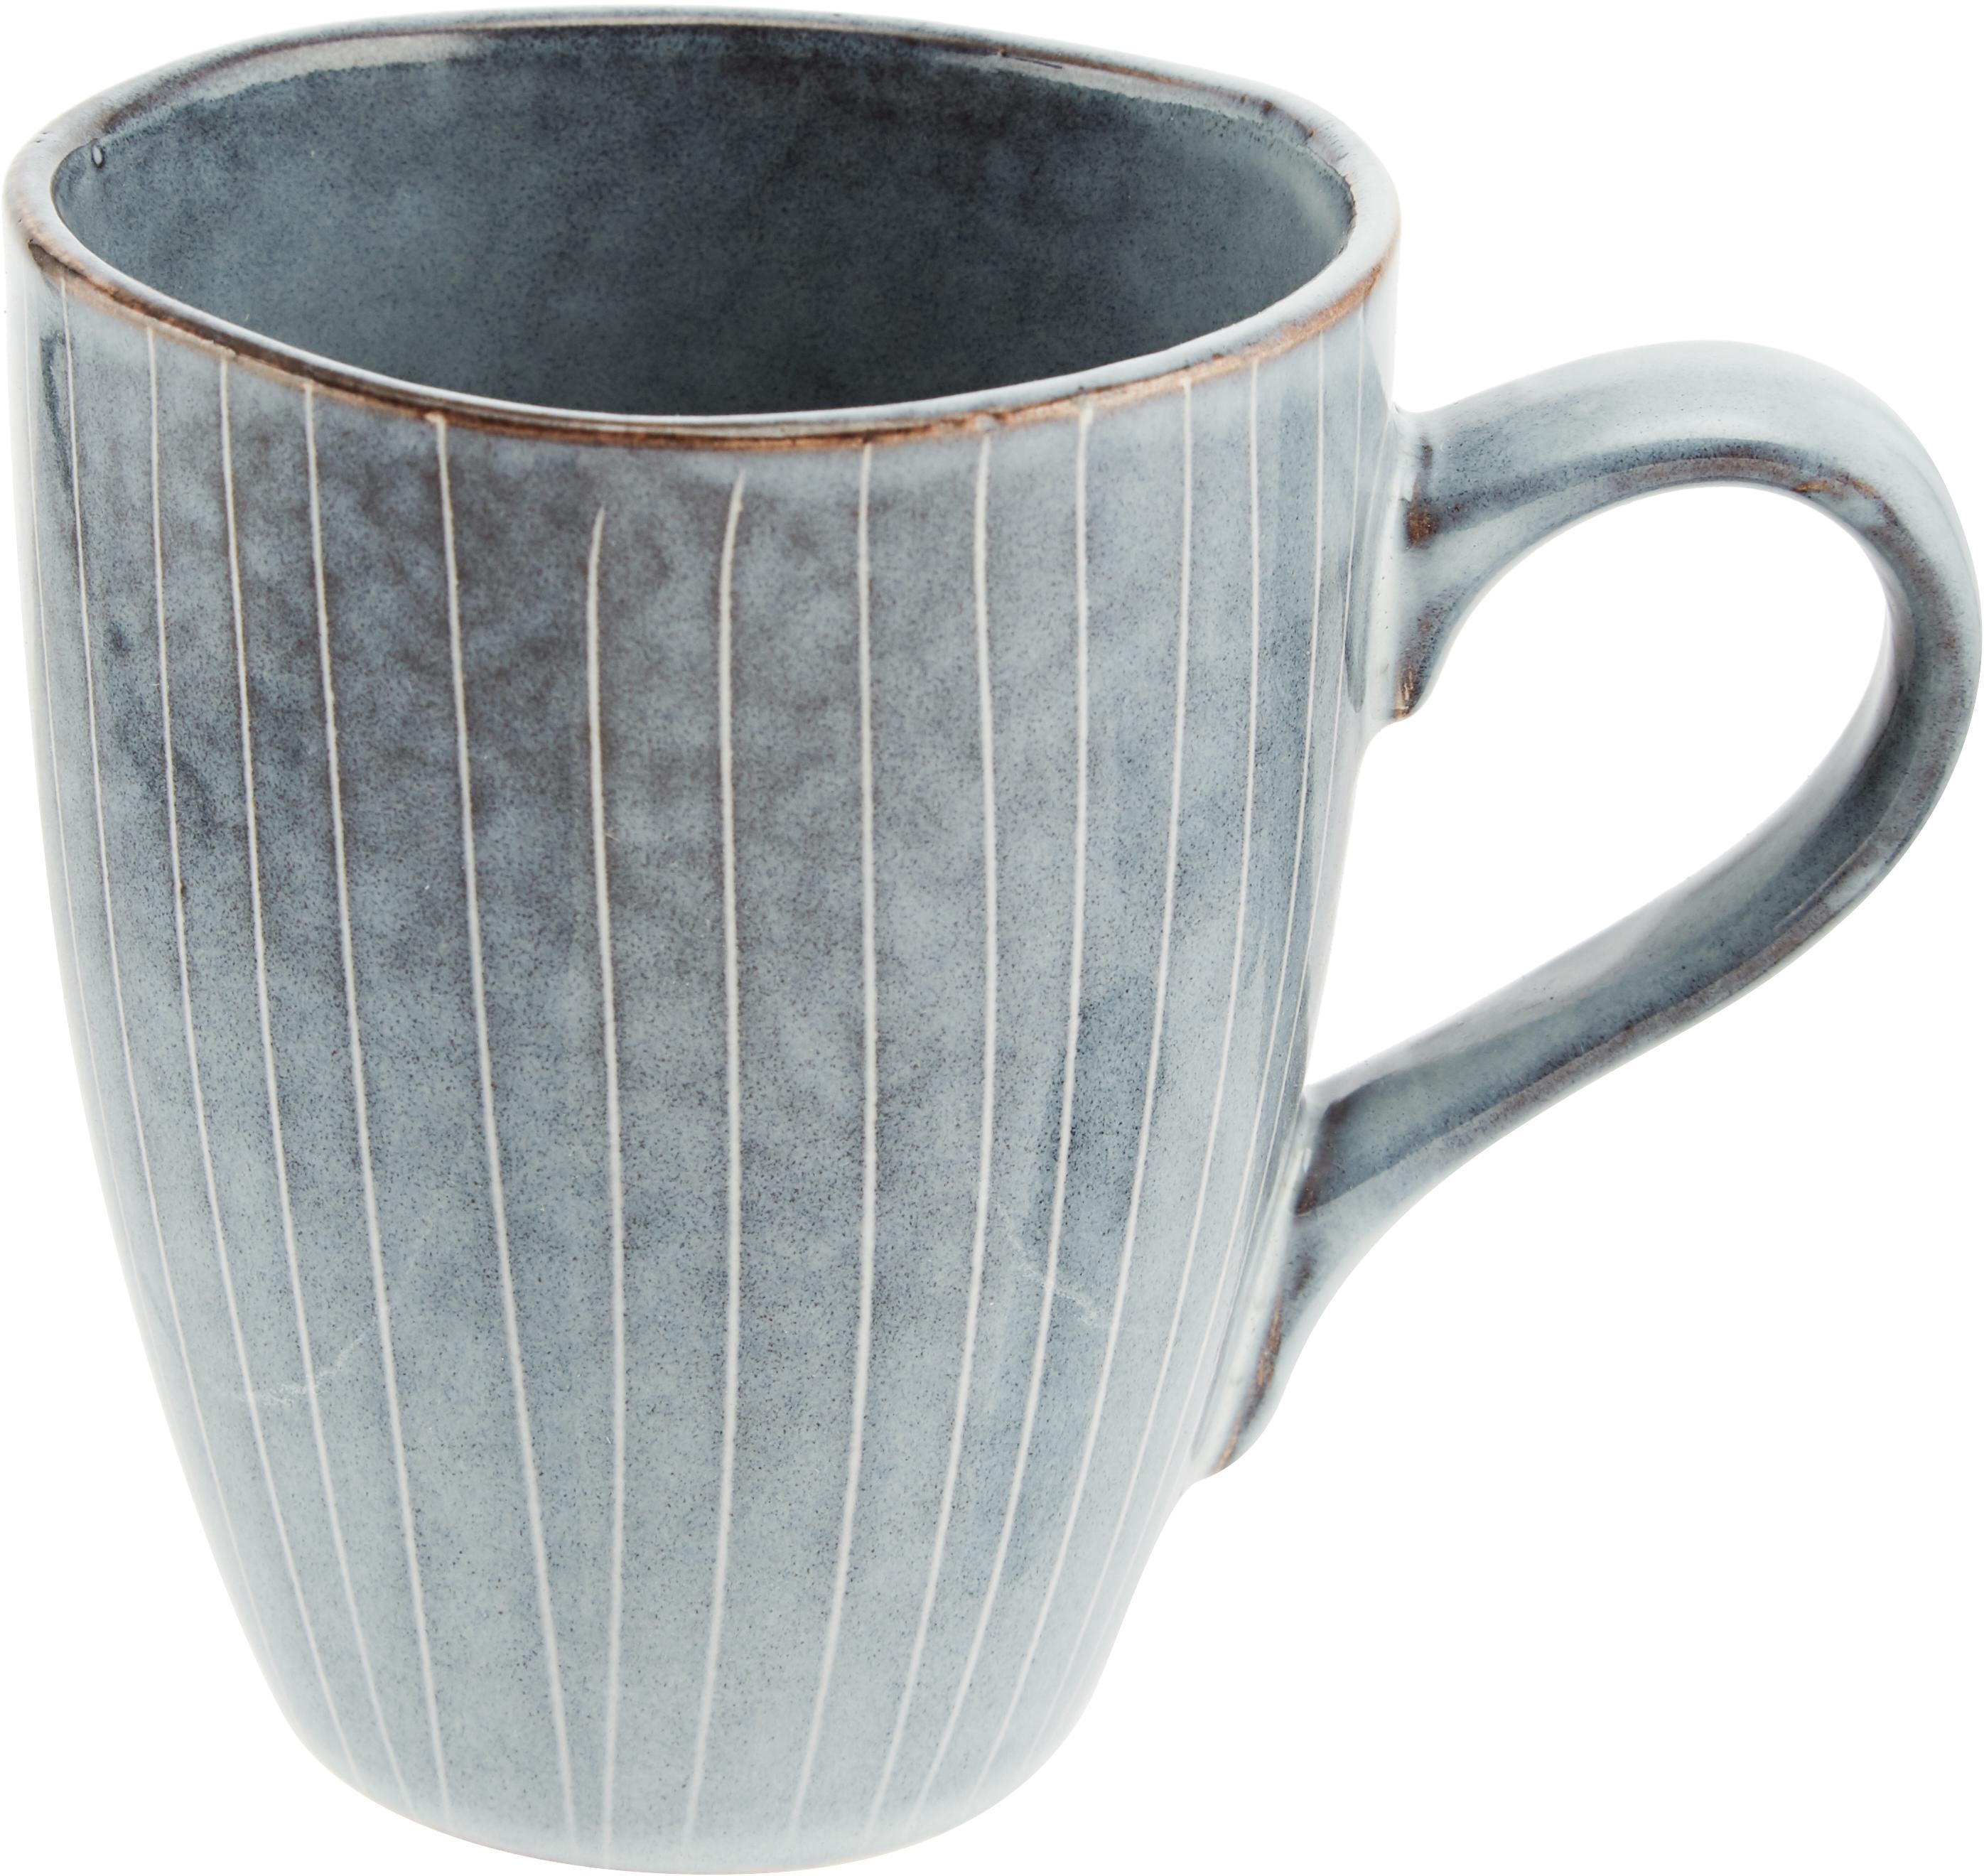 Tazza in terracotta fatta a mano Nordic Sea 6 pz, Terracotta, Grigio e tonalità blu, Ø 8 x Alt. 10 cm